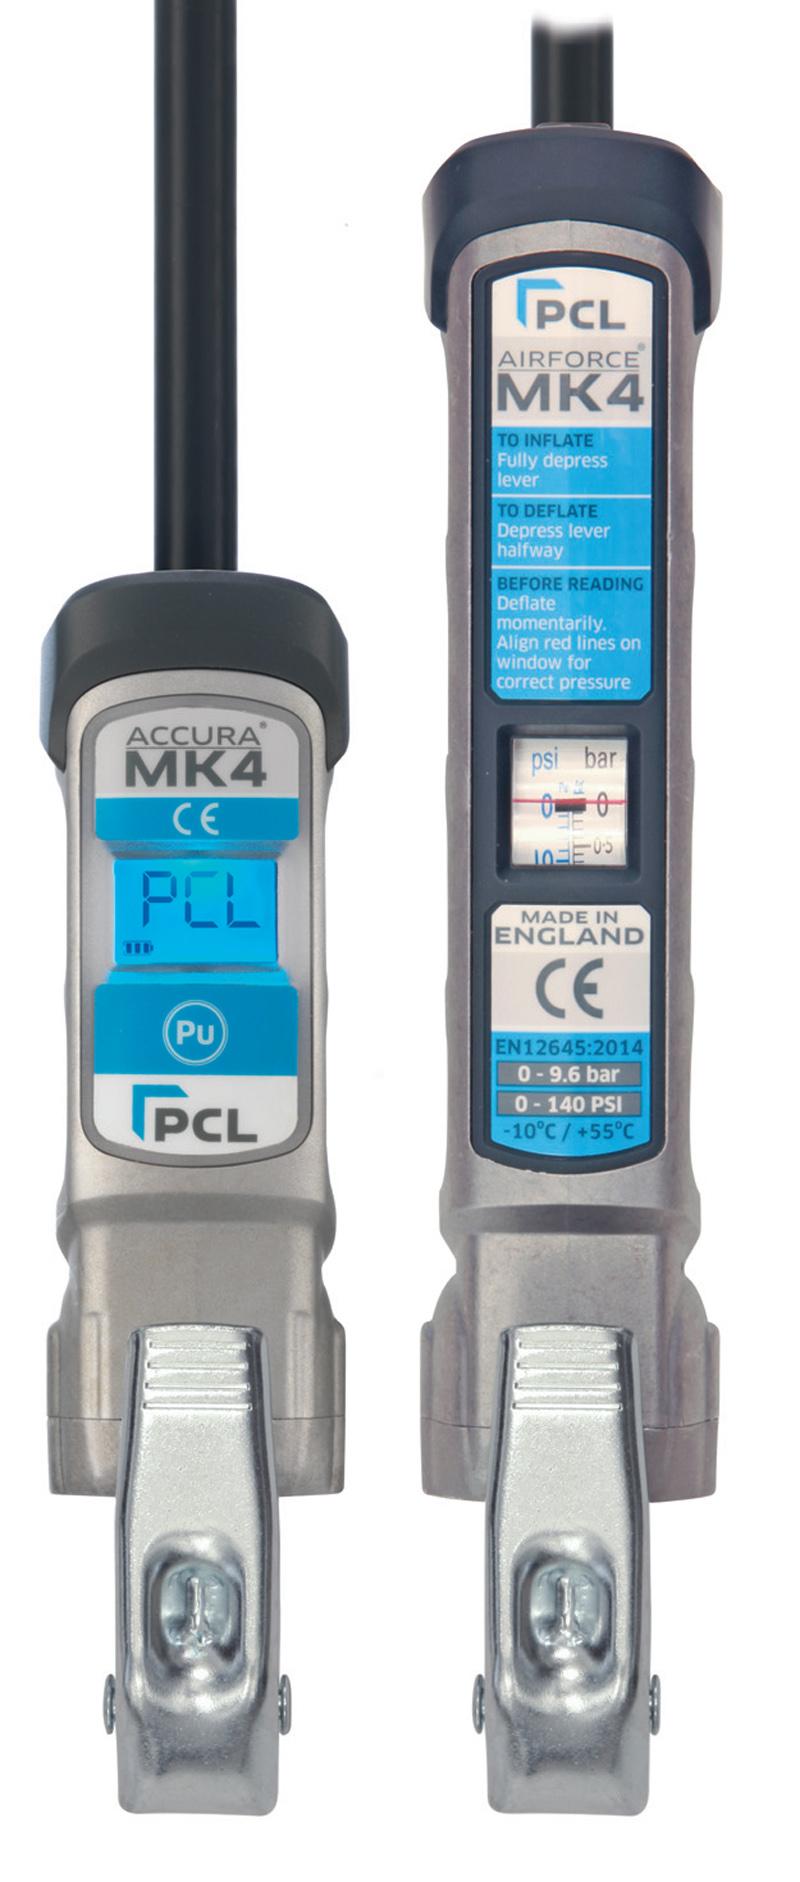 PCL announces warranty extension on MK4 range